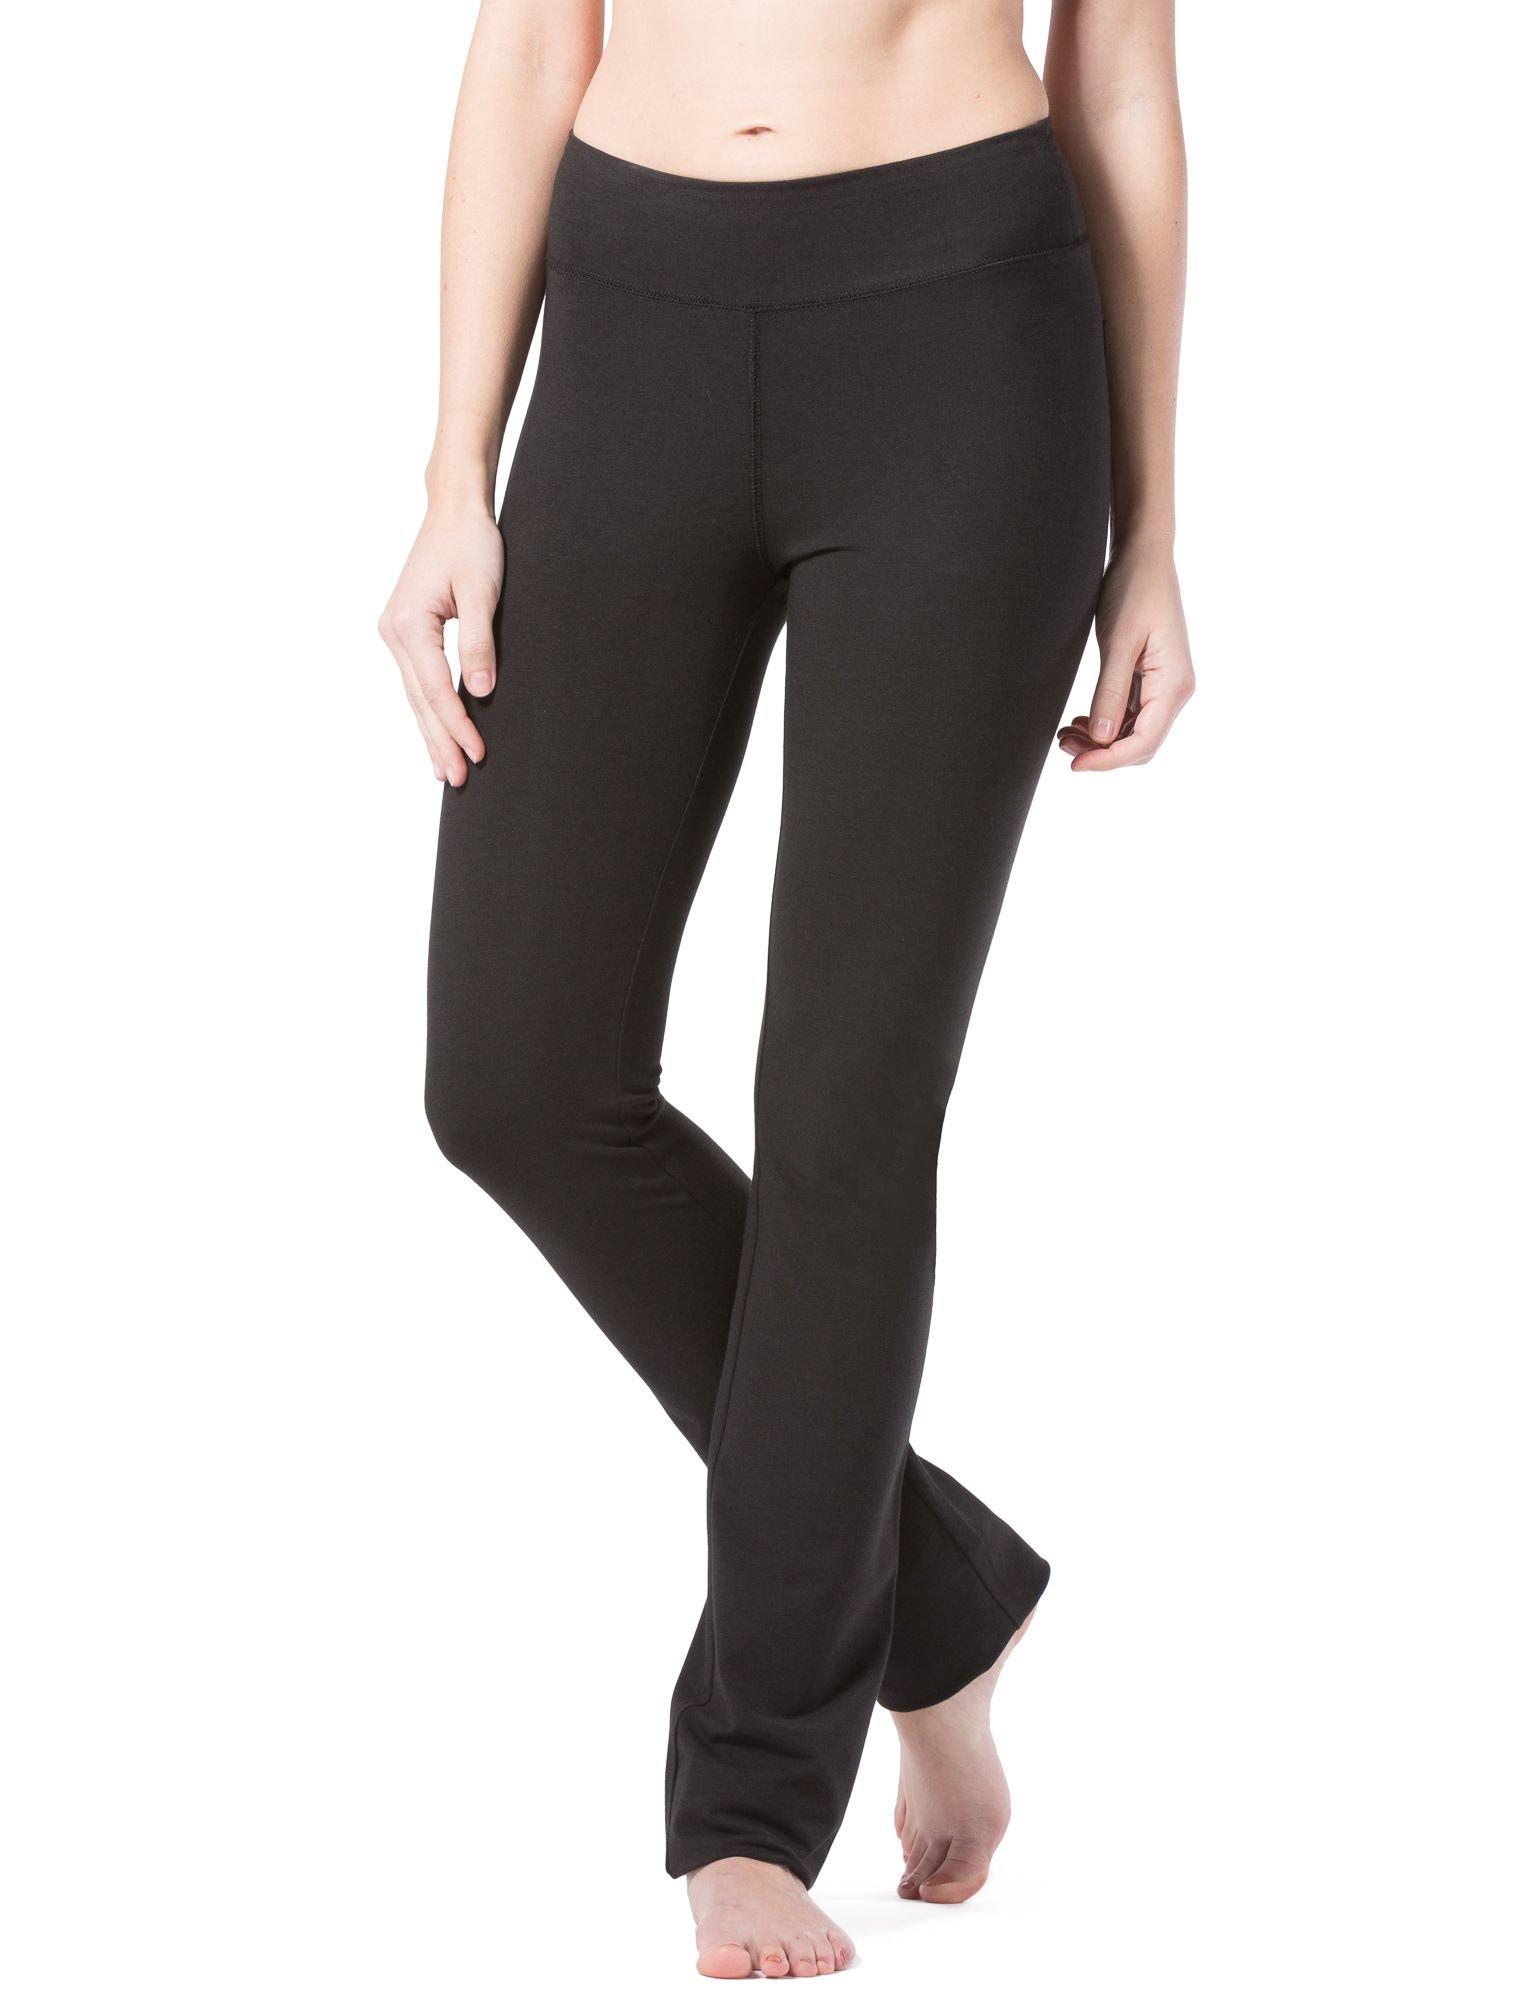 Fishers Finery Women's Ecofabric Straight Leg Yoga Pant with Back Pockets